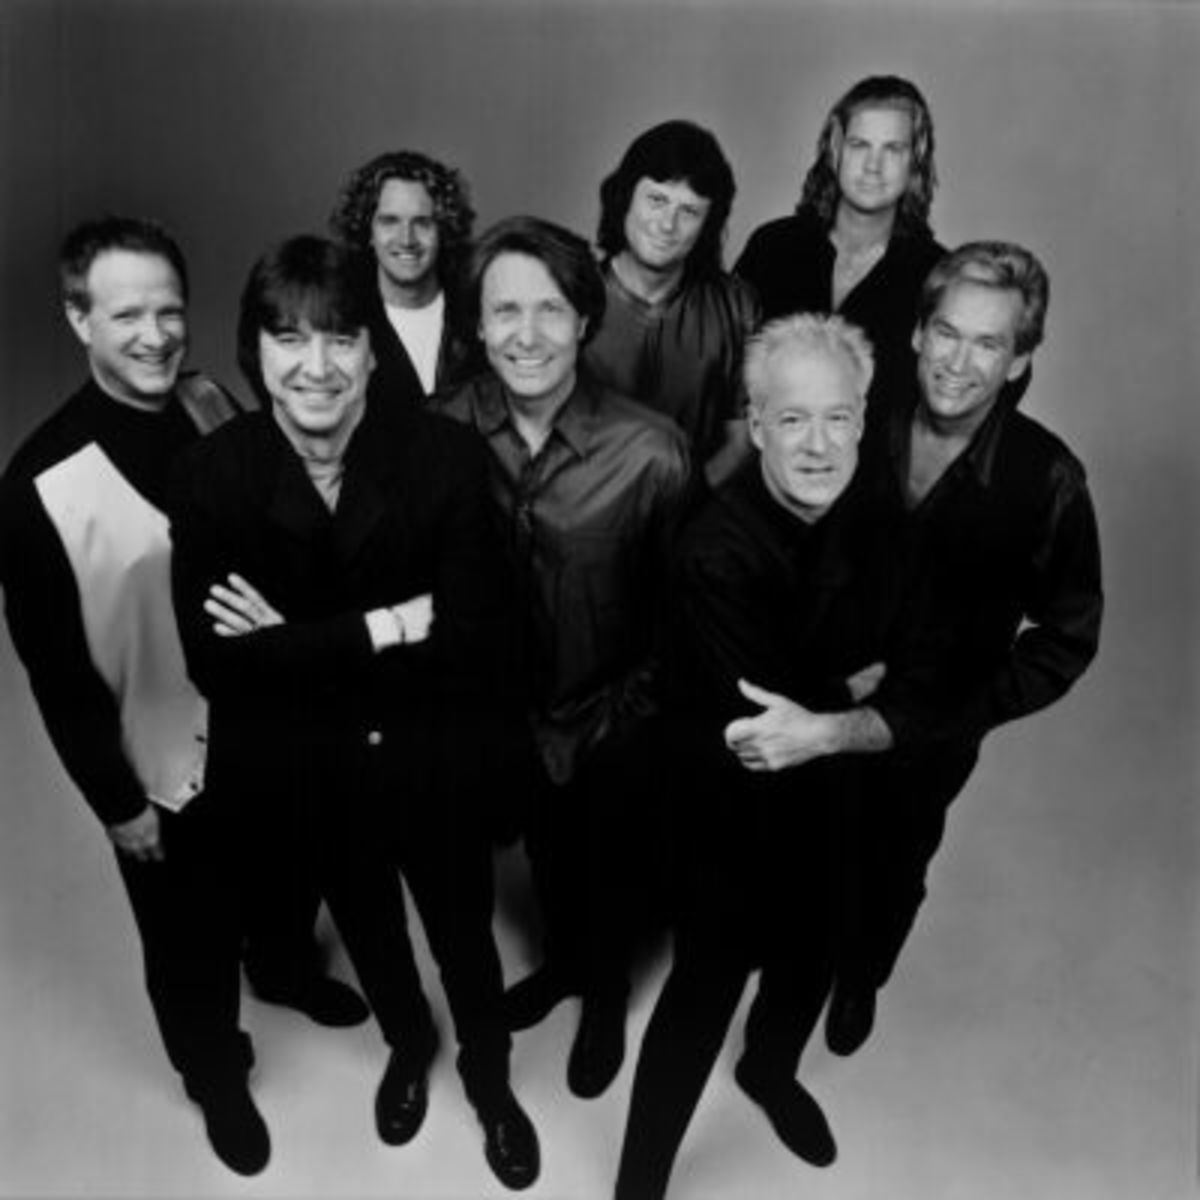 Lee Loughnane; Walt Parazaider;  Jason Scheff; Robert Lamm;  Tris Imboden; James Pankow;  Keith Howland; Bill Champlin